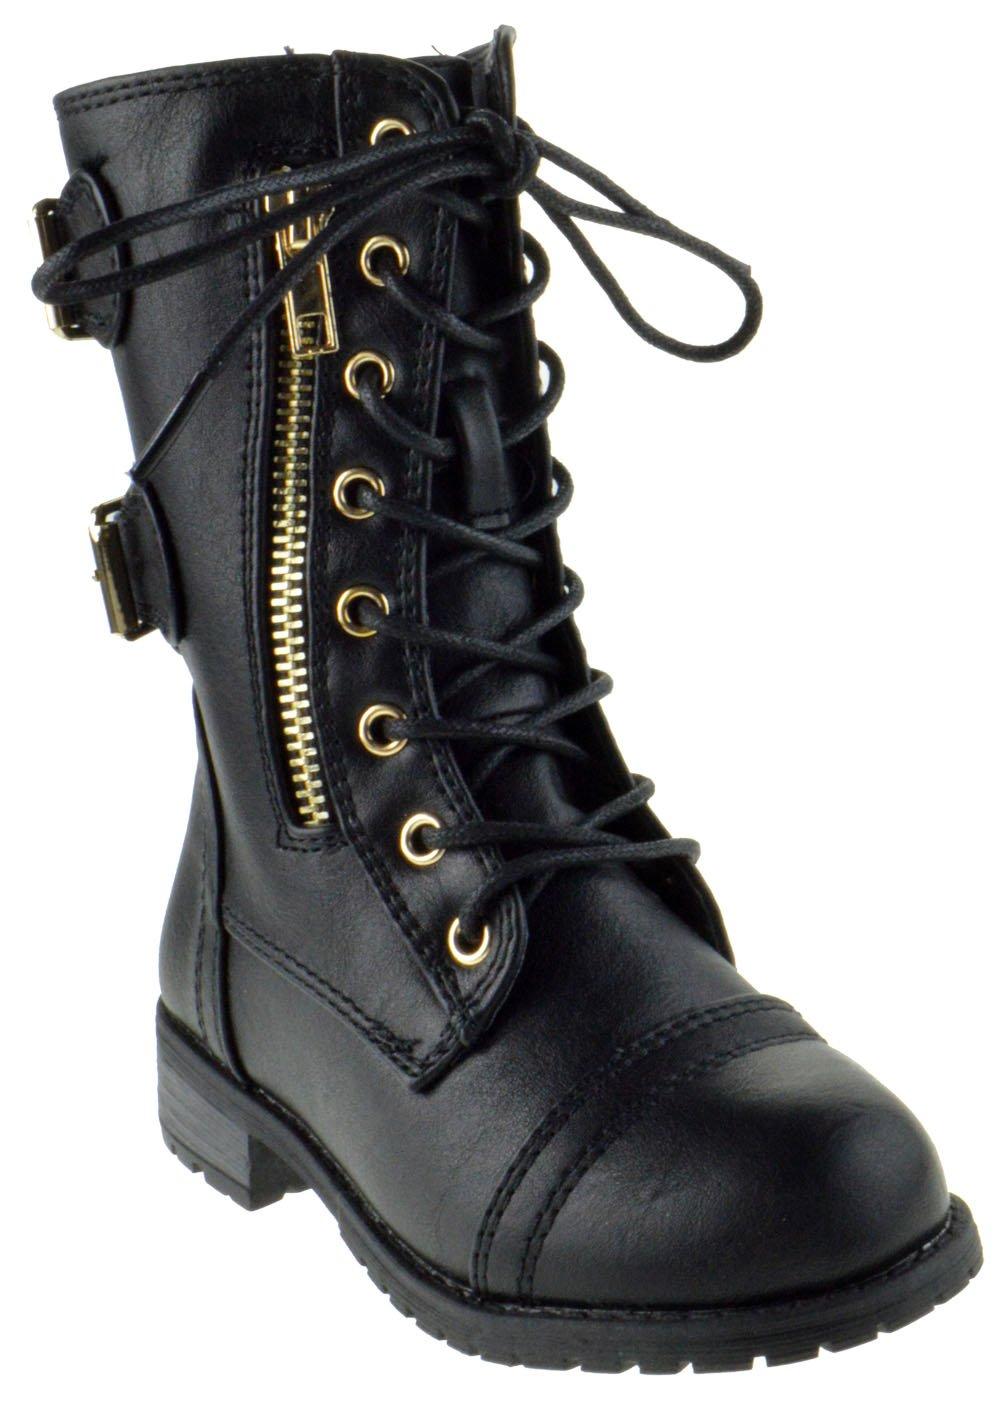 Mango 71 KA Baby Girls Combat Lace Up Boots Black 8 Toddler